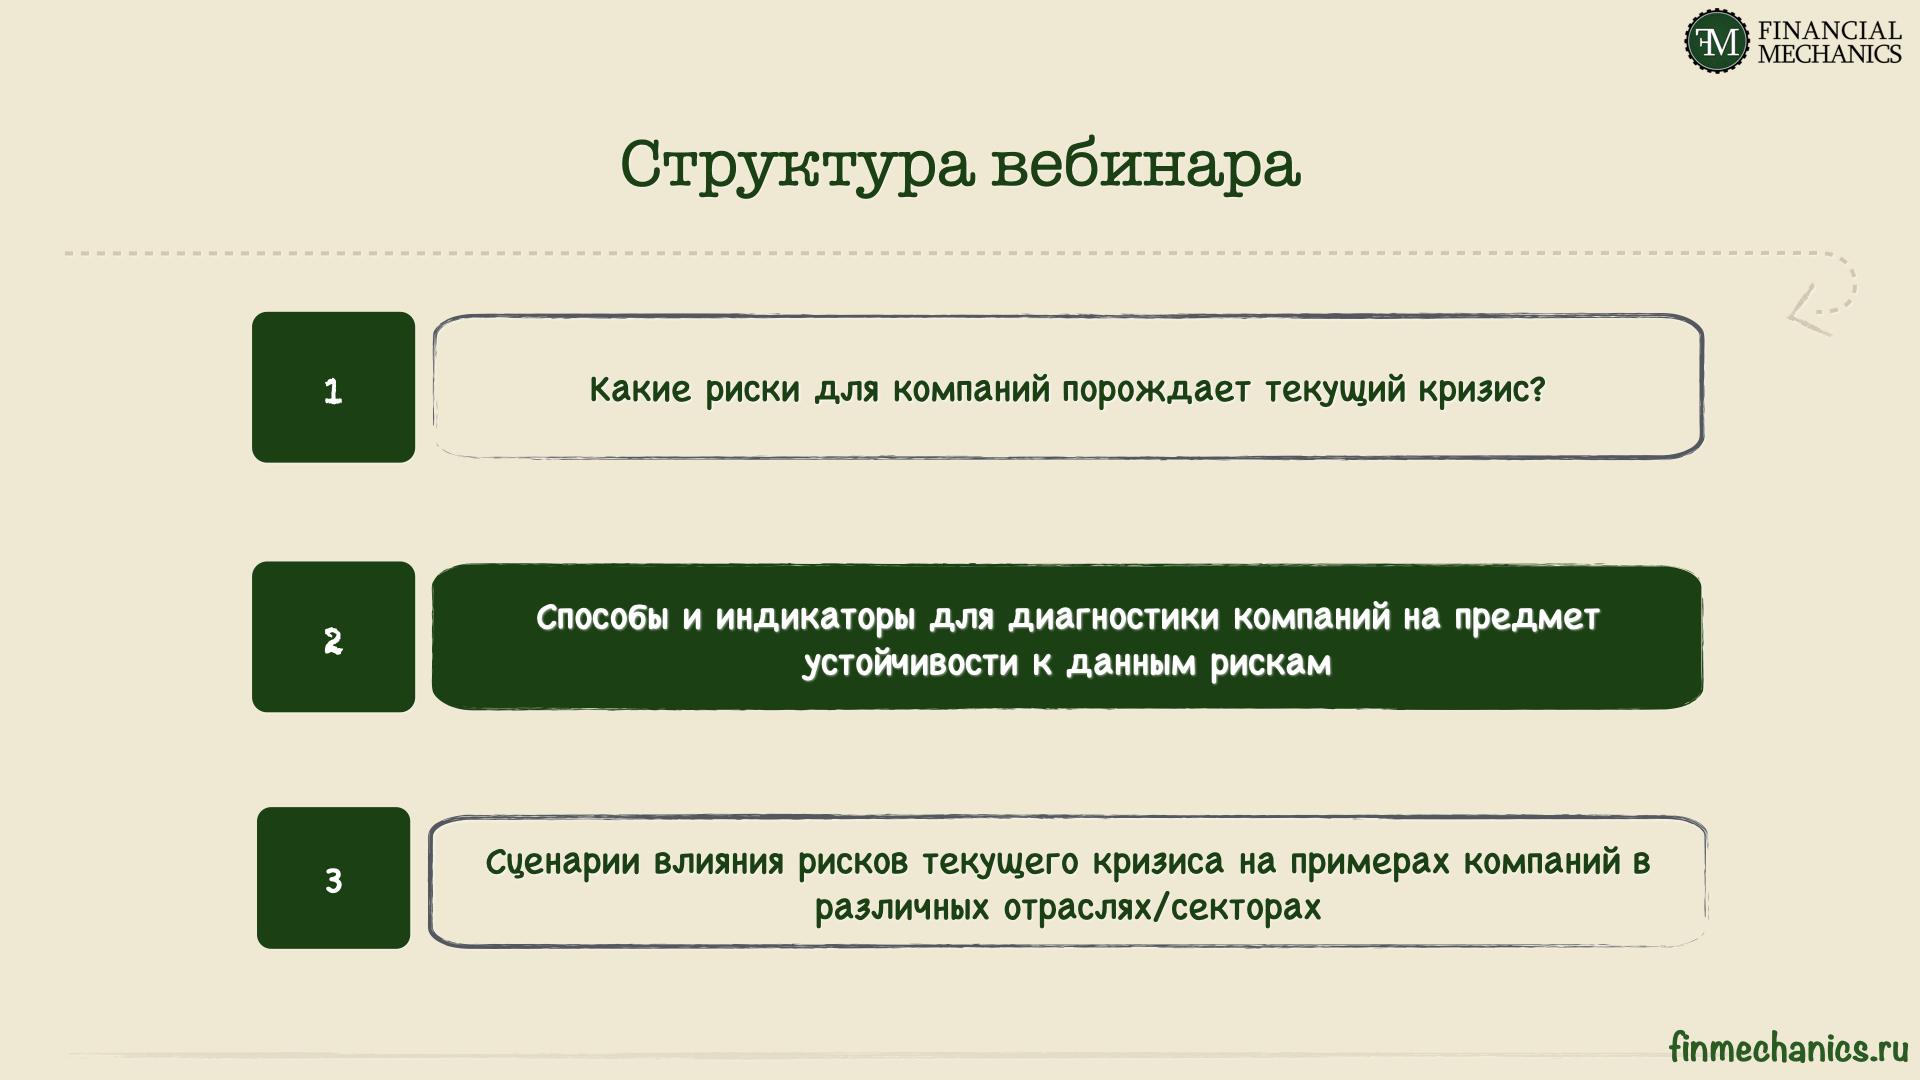 ACCA_2020_07_04_V2.019